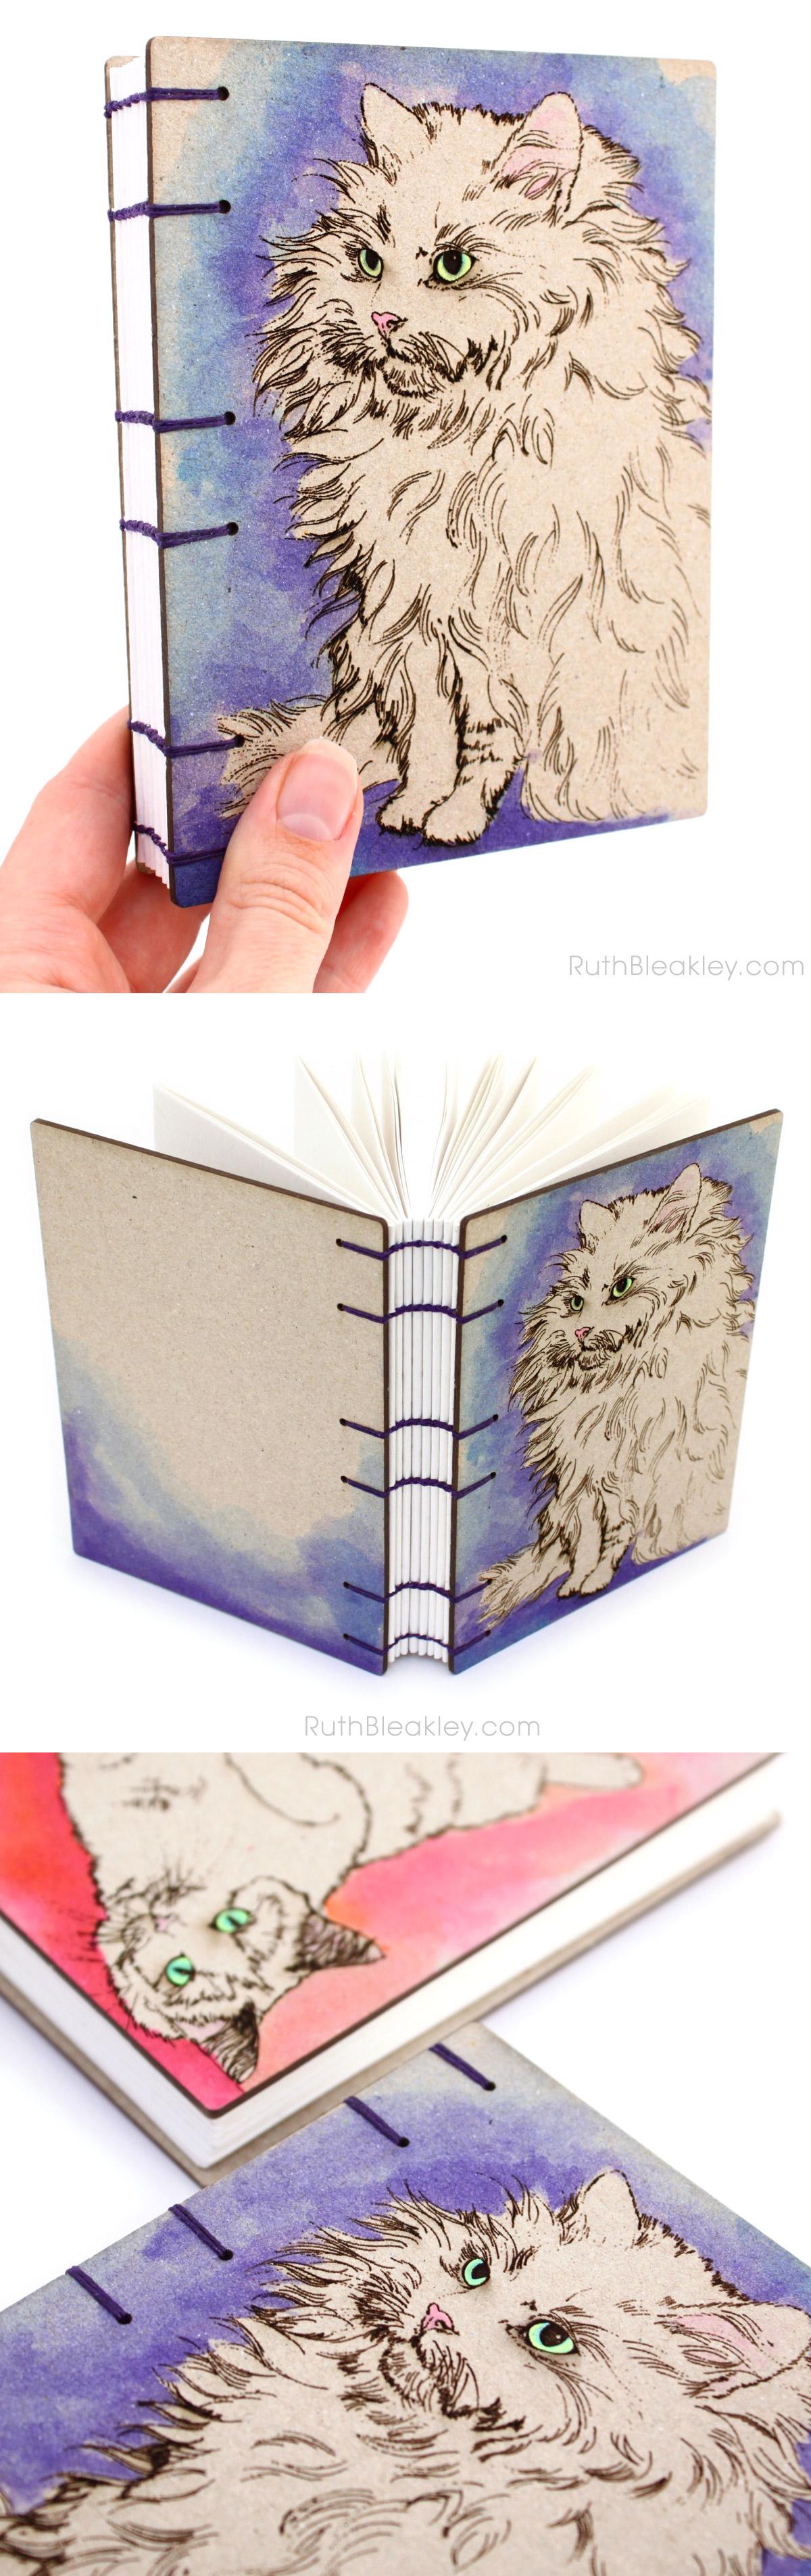 Purple Cat Journal handmade by bookbinder Ruth Bleakley